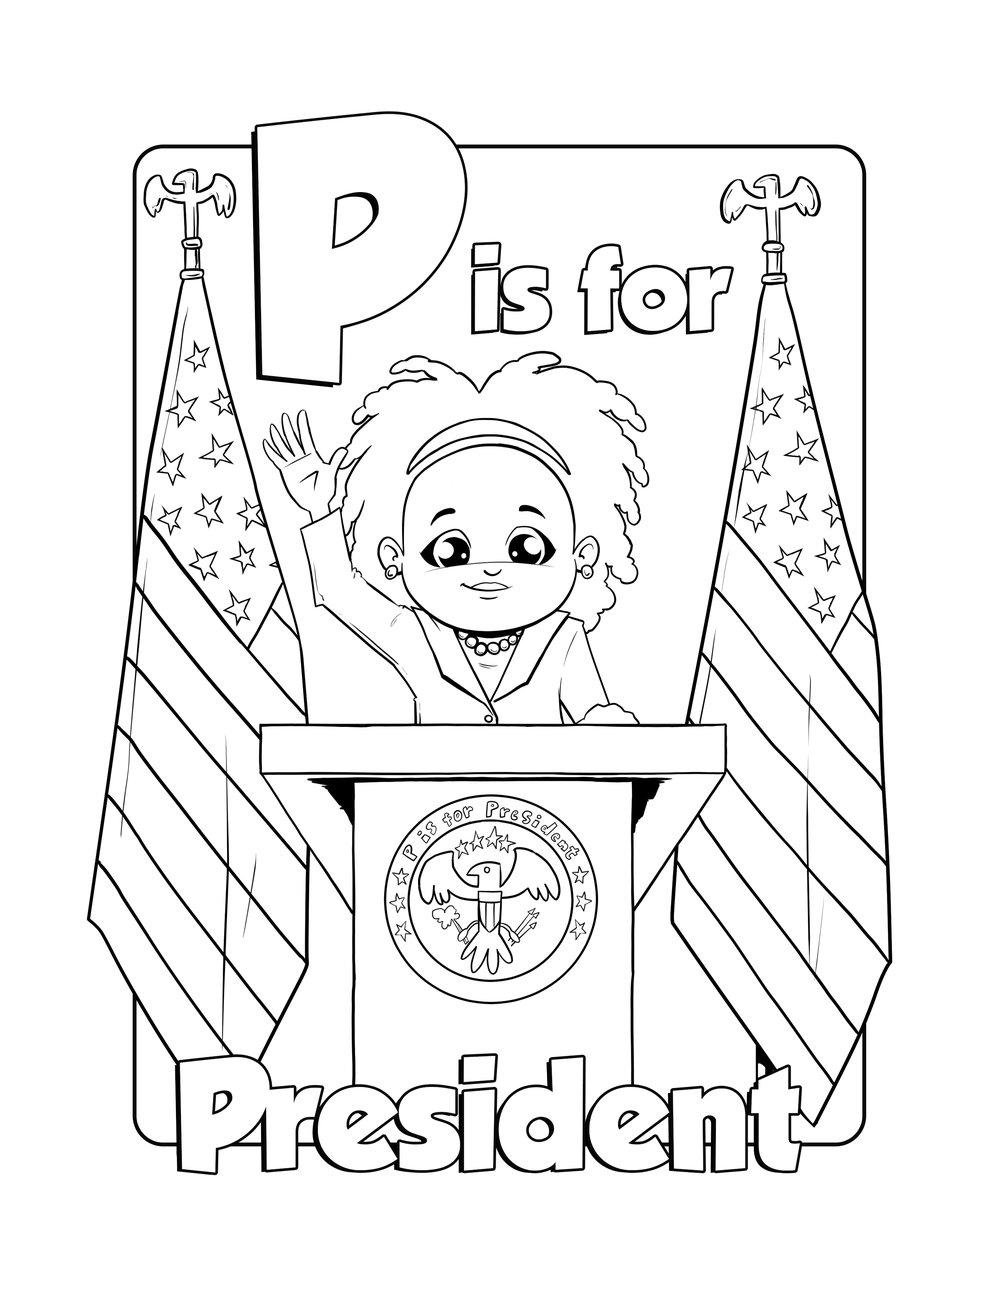 PisforPresident_KickstarterElectionPages-1.jpg